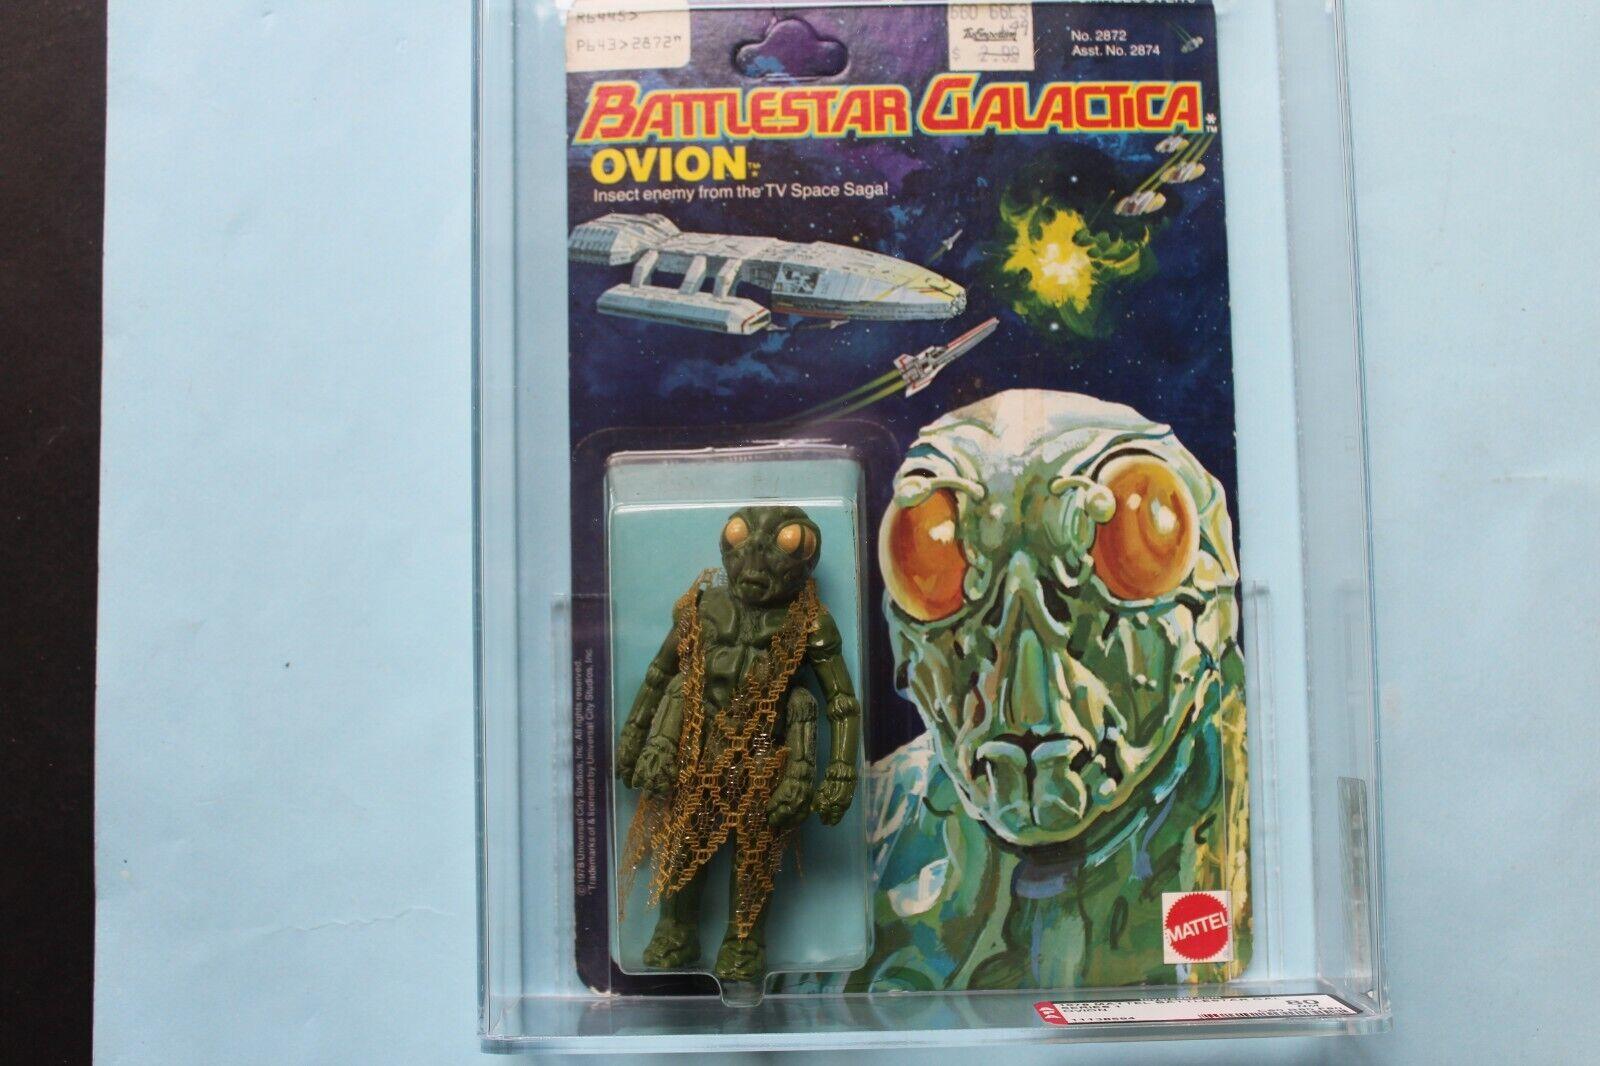 Battlestar Galactica OVION  UKG MOC  AFA 80 Graded  Action Figure Mattel 1978